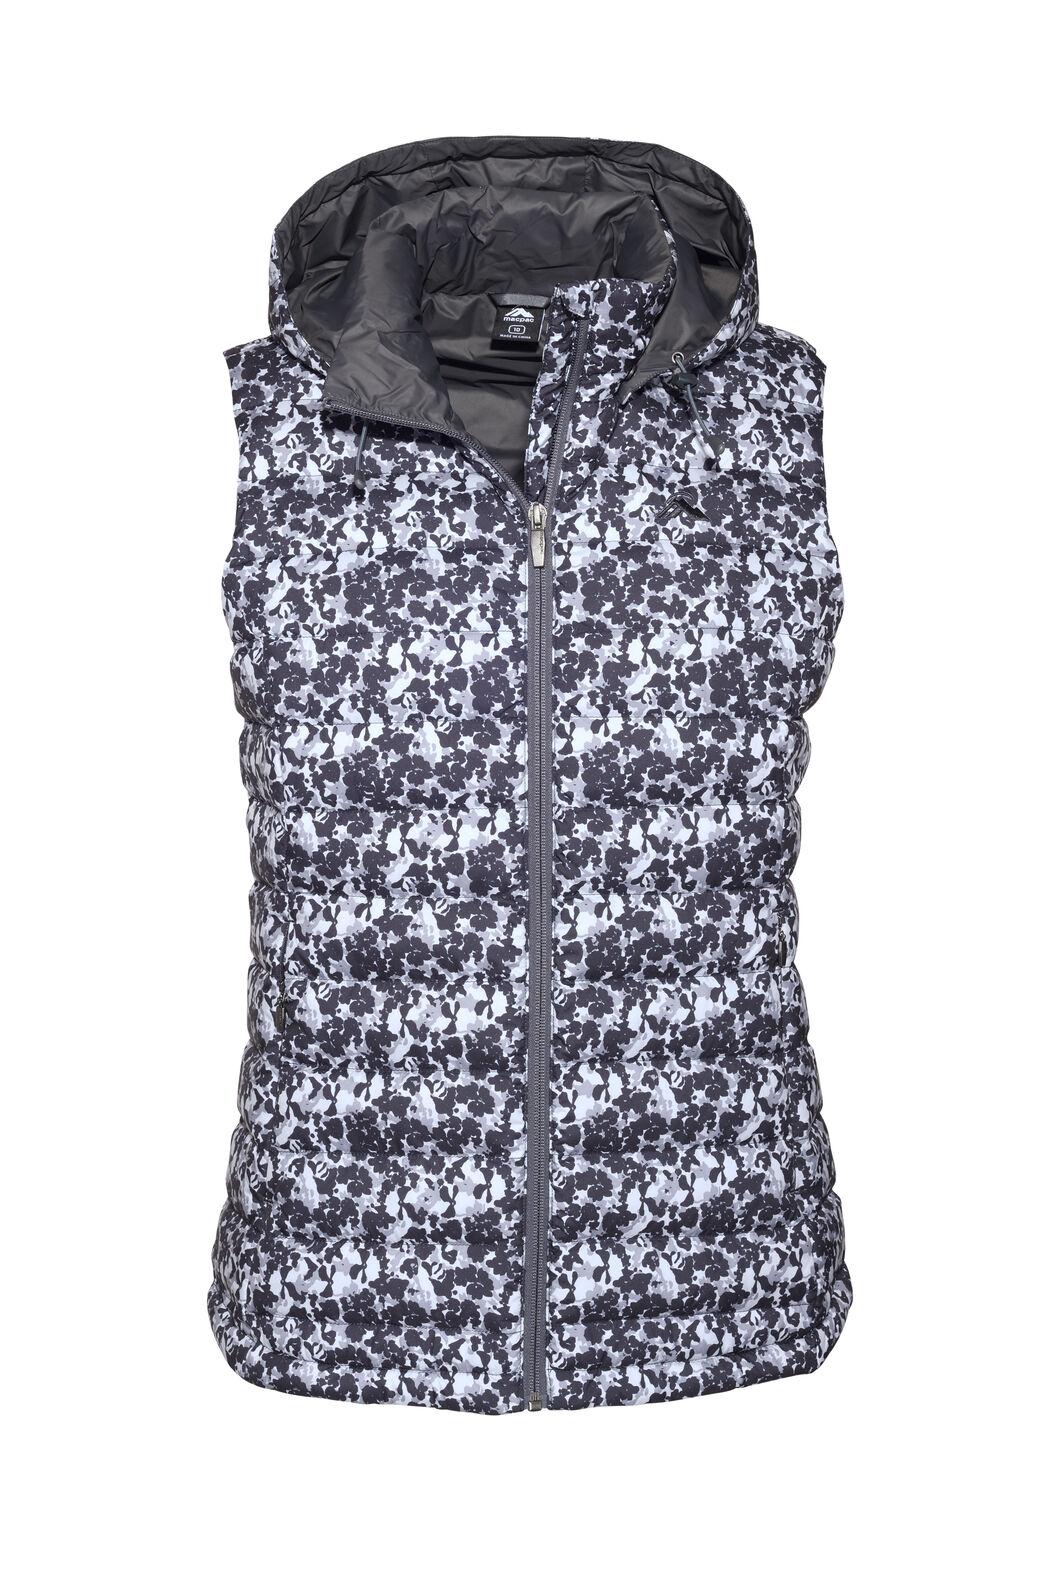 Macpac Women's Zodiac Hooded Down Vest, Black/High RIse, hi-res